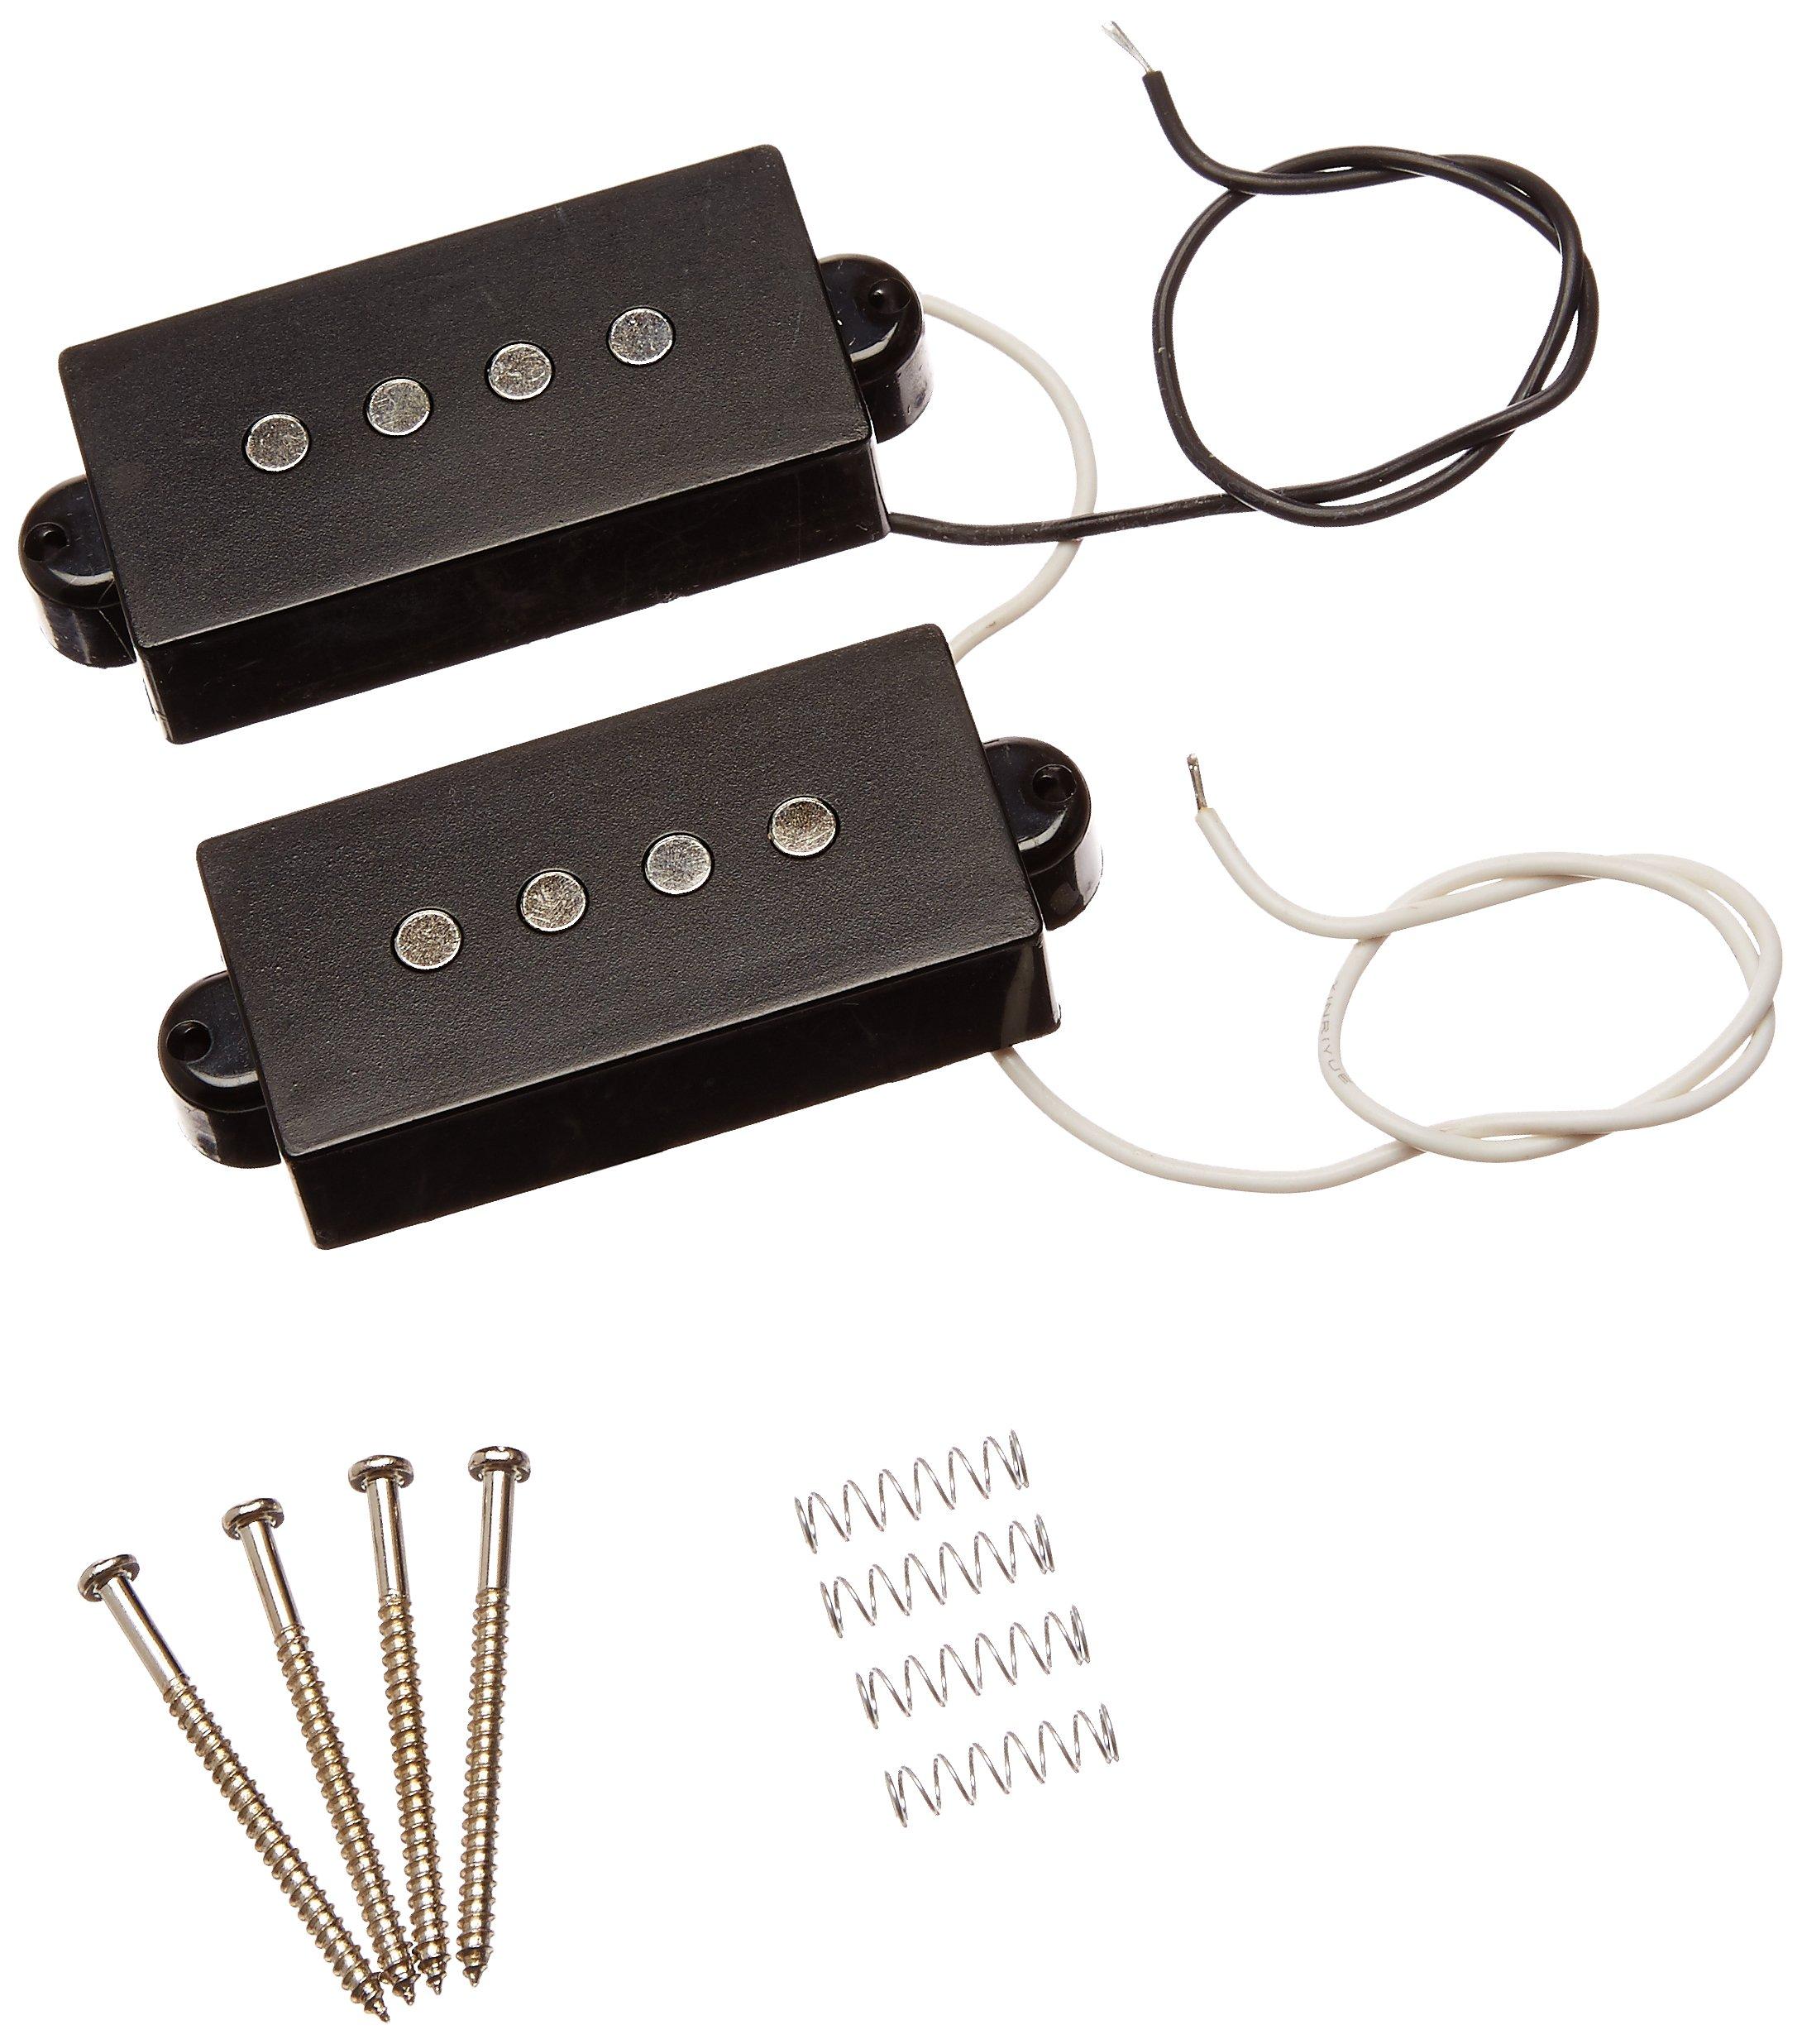 4 string noiseless humbucker pickup set f precision p bass replacement 1 set ebay. Black Bedroom Furniture Sets. Home Design Ideas